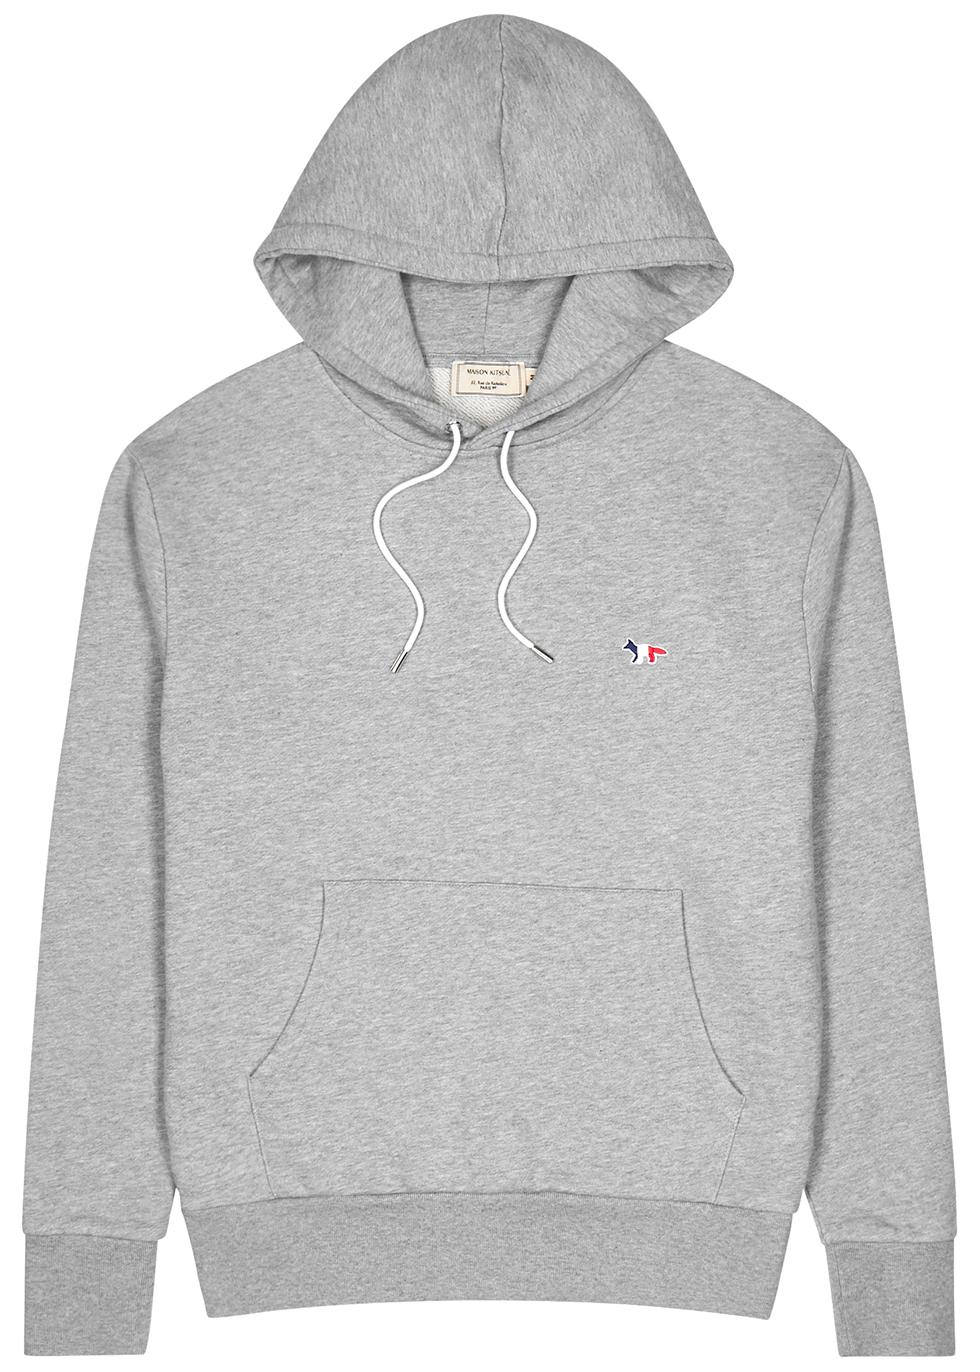 Grey hooded cotton-jersey sweatshirt